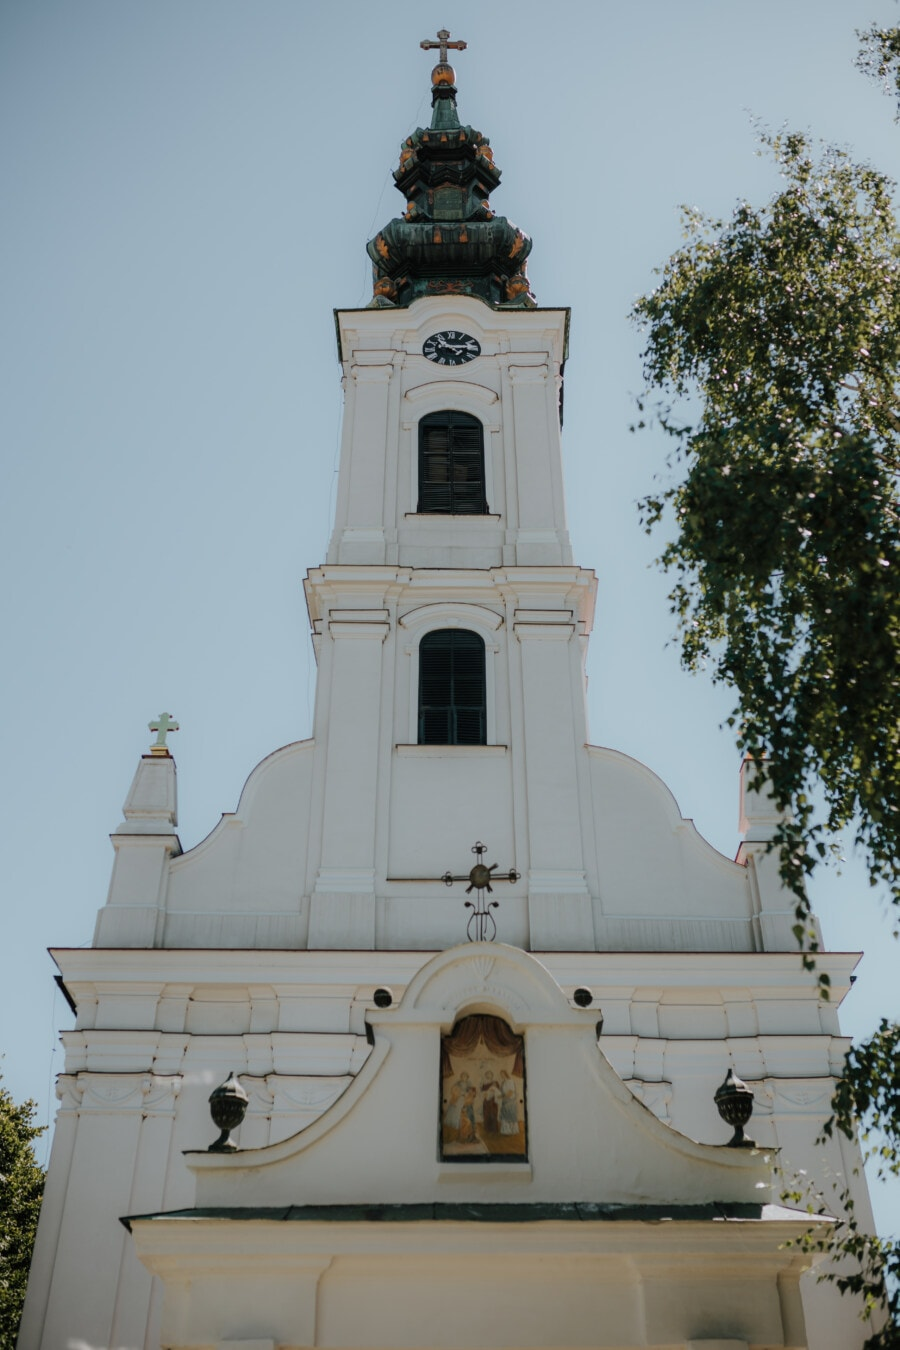 weiß, Kirche, Kirchturm, orthodoxe, Turm, Religion, Architektur, Verkleidung, Kreuz, kathedrale